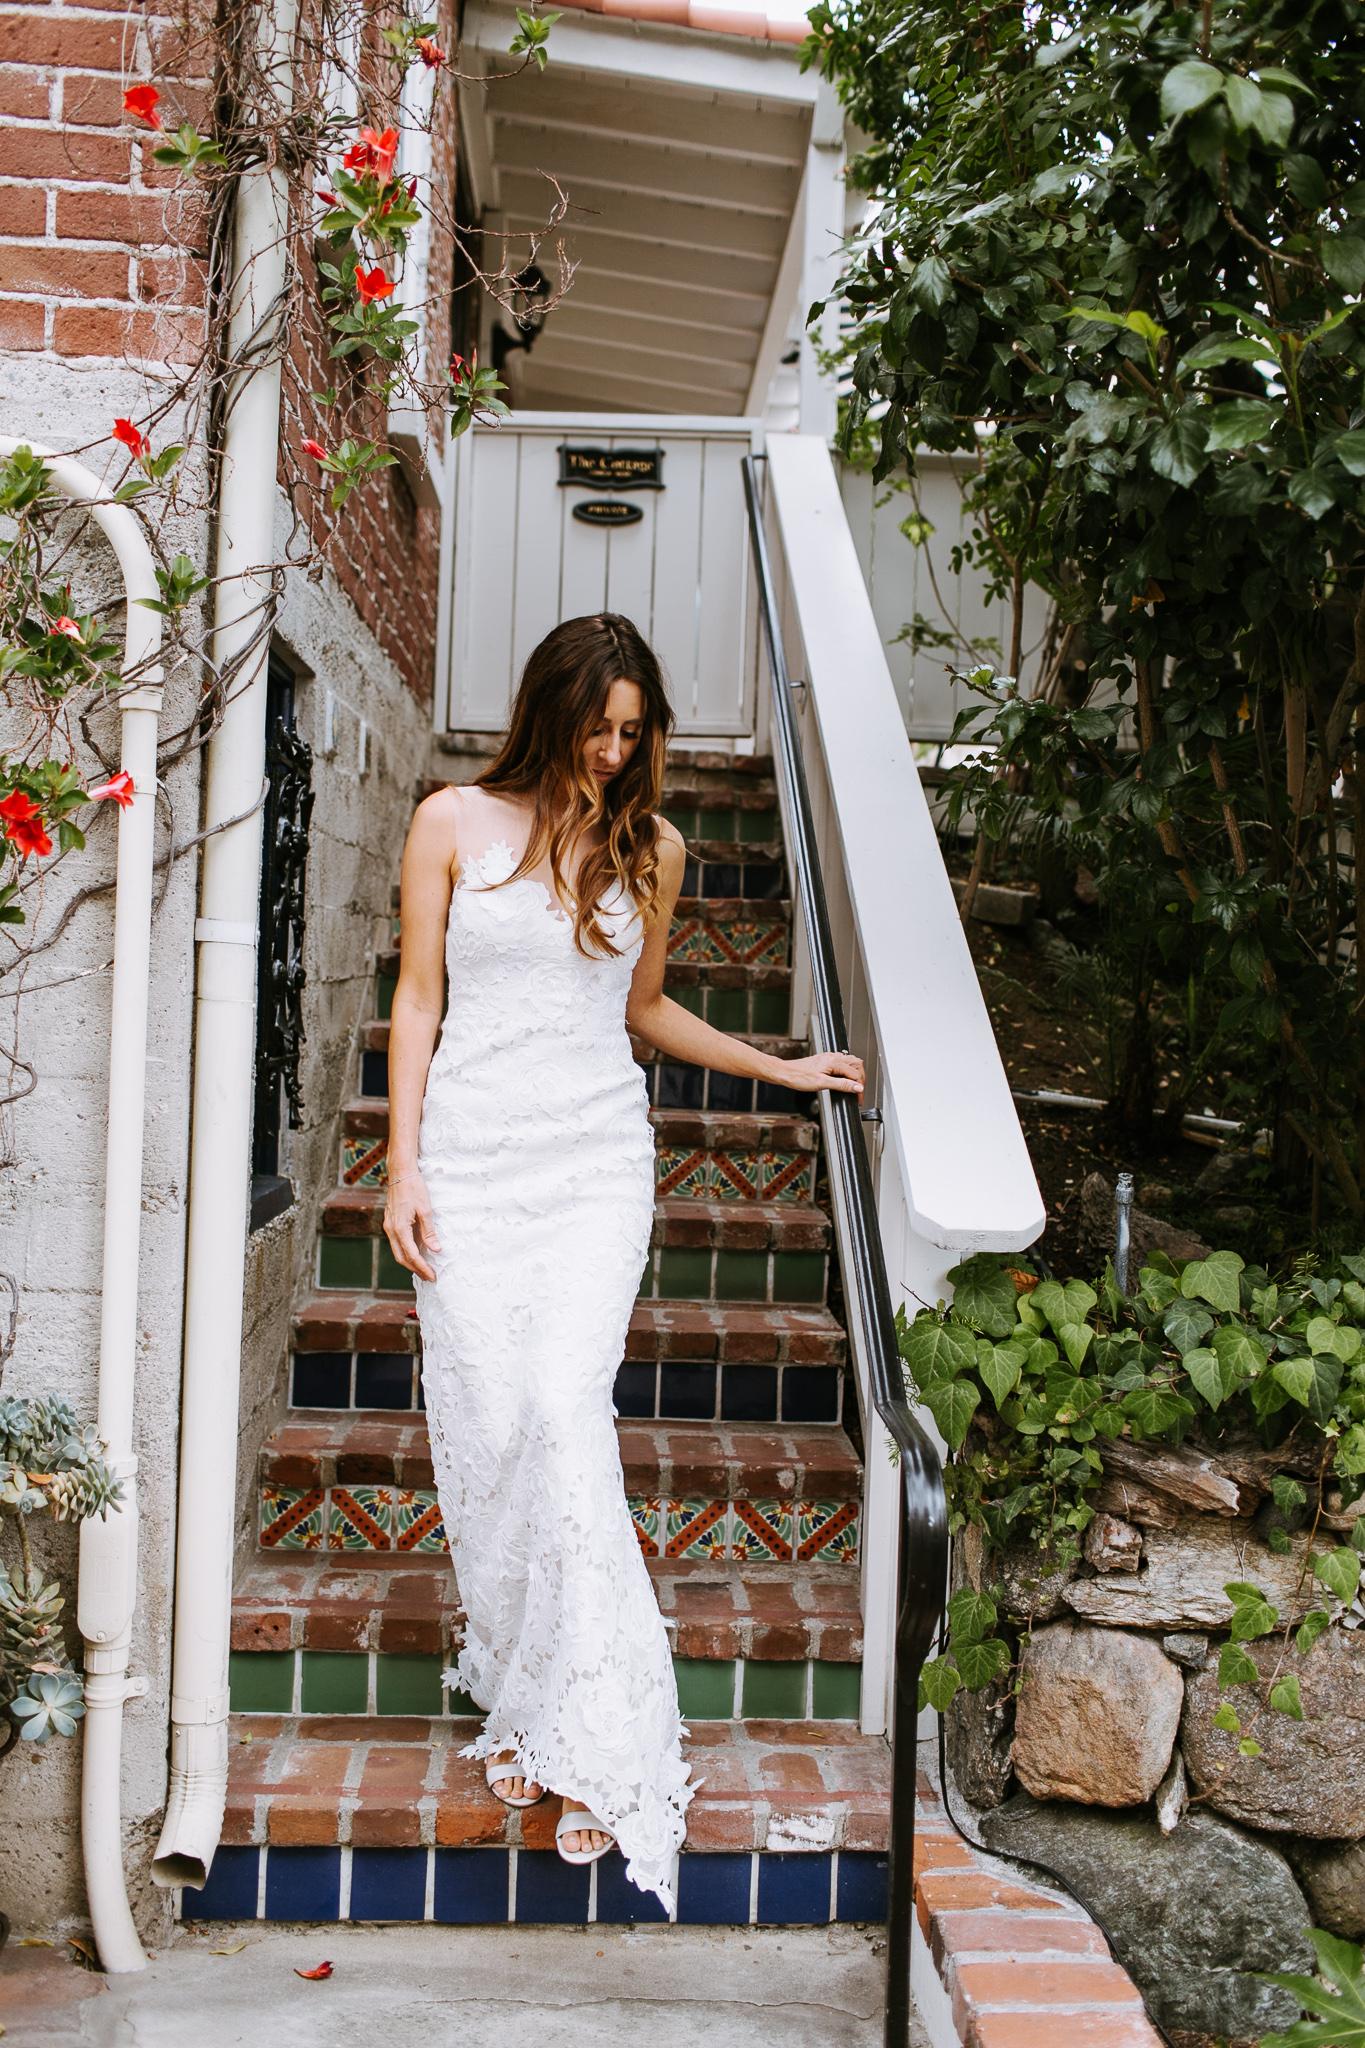 LagunaBeach-WeddingPhotographer-12.jpg